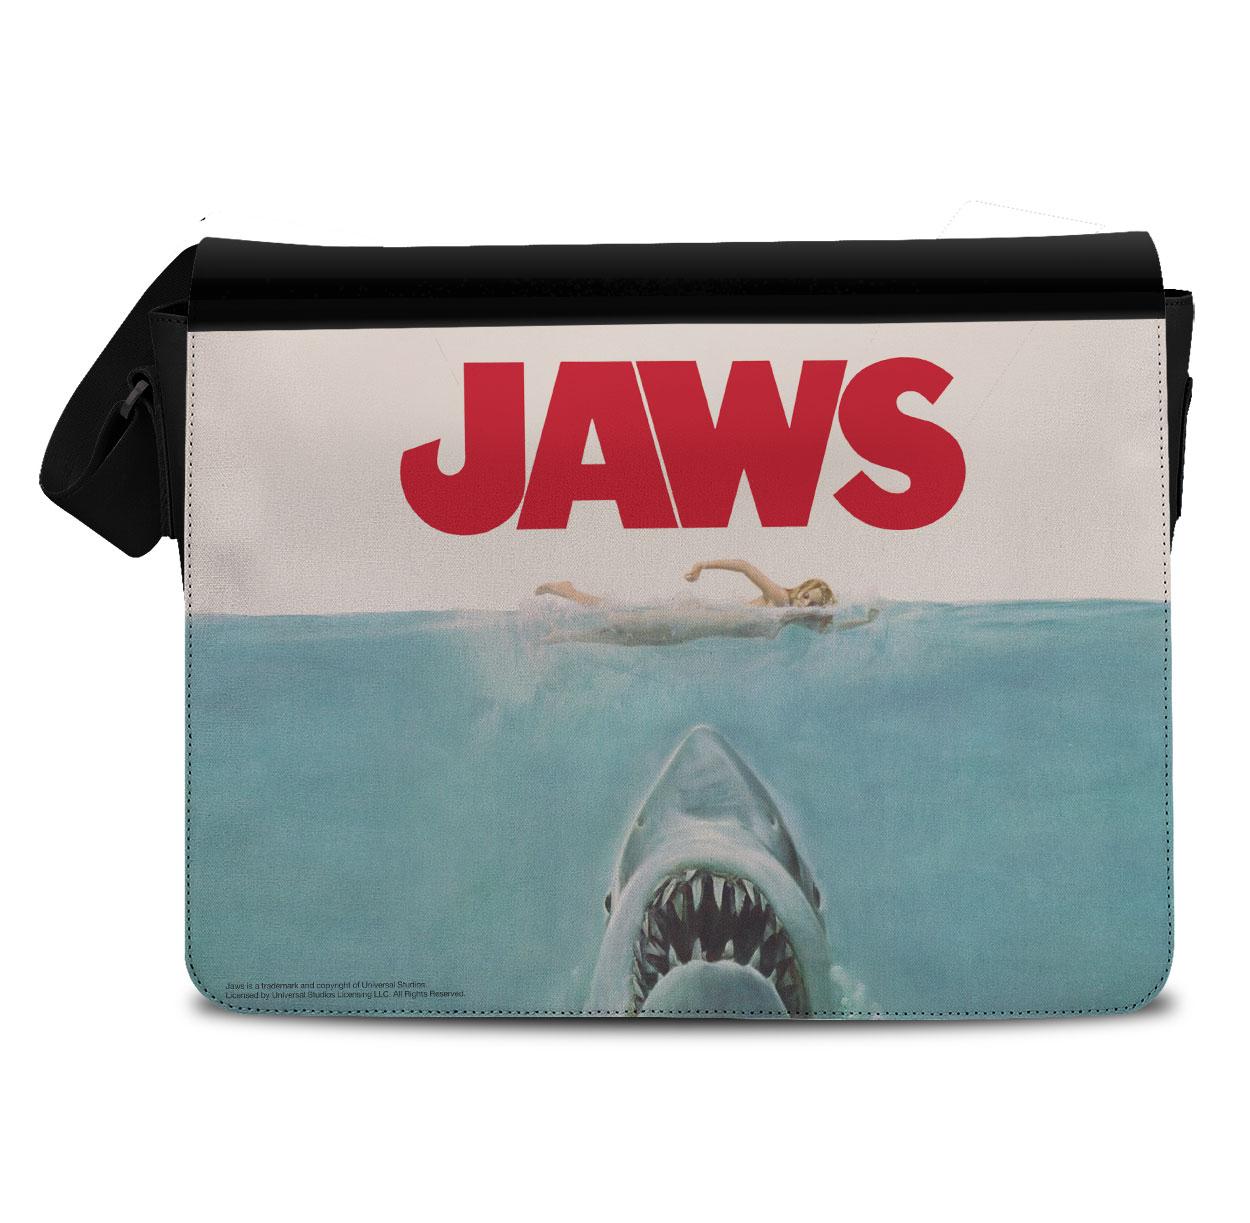 JAWS Poster Messenger Bag